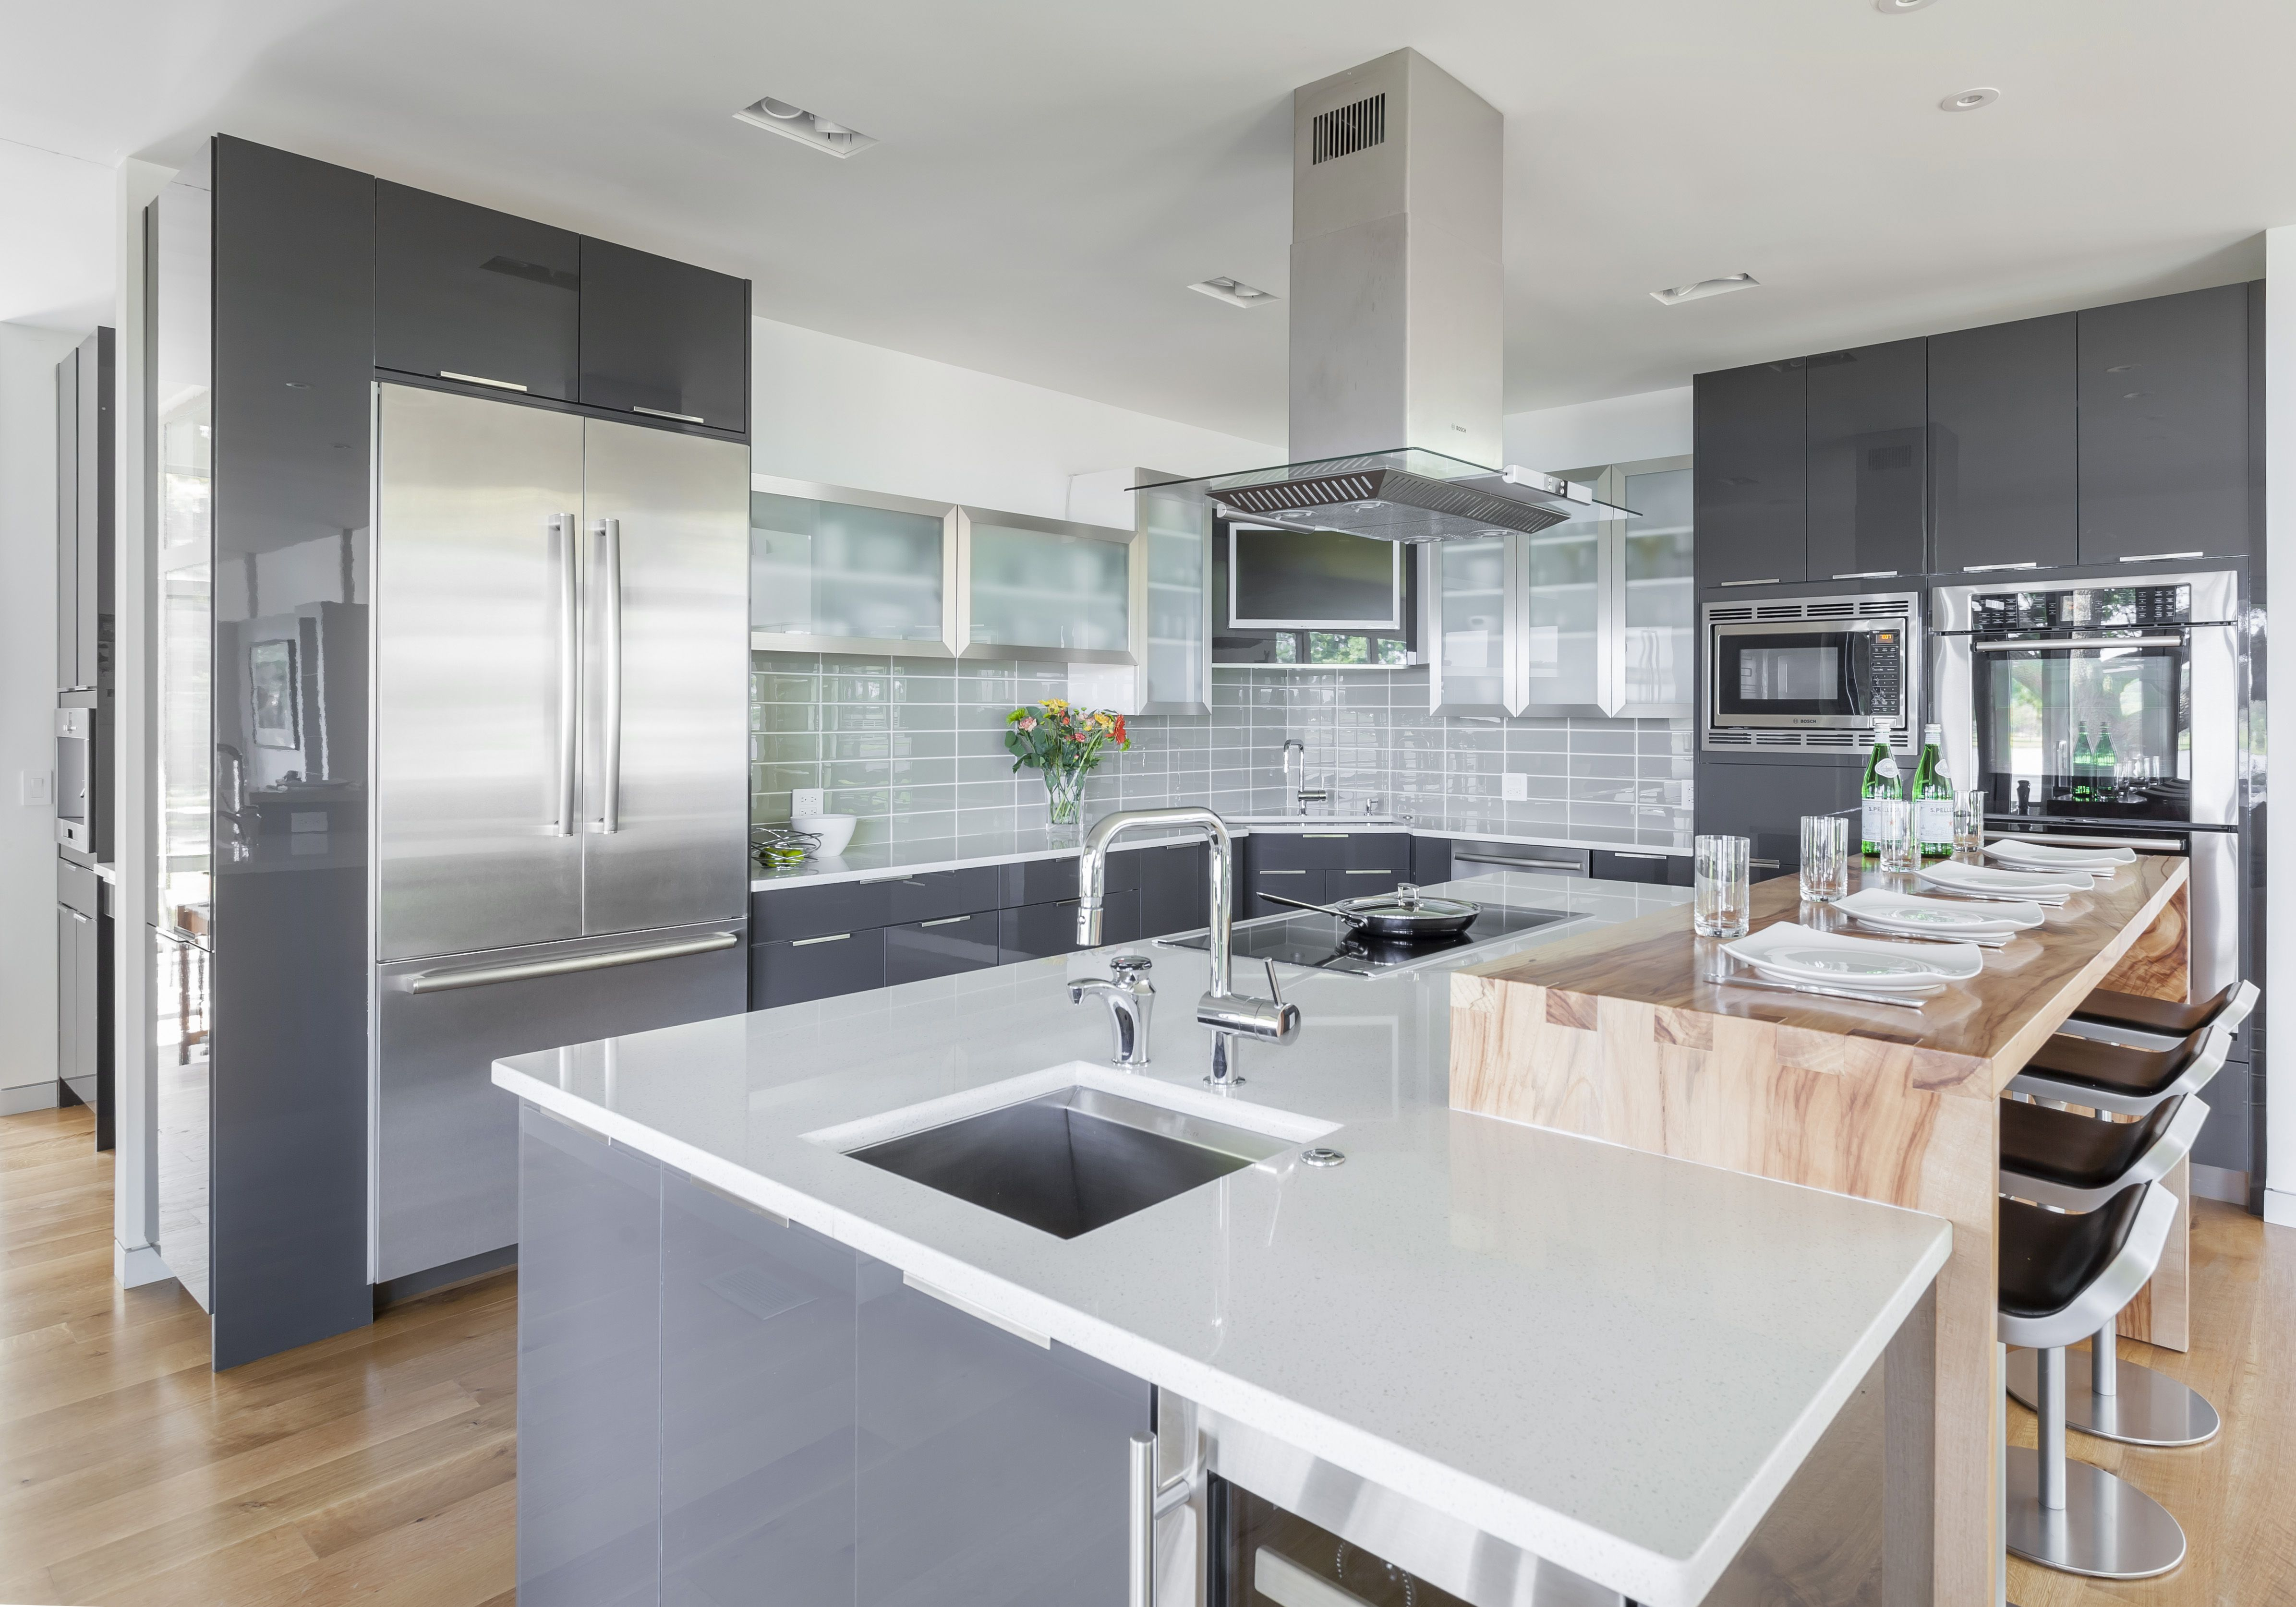 Elmwood Cabinetry, Bosch Appliances, Waterfall Wood Bar Top, Hand Washing  Sink